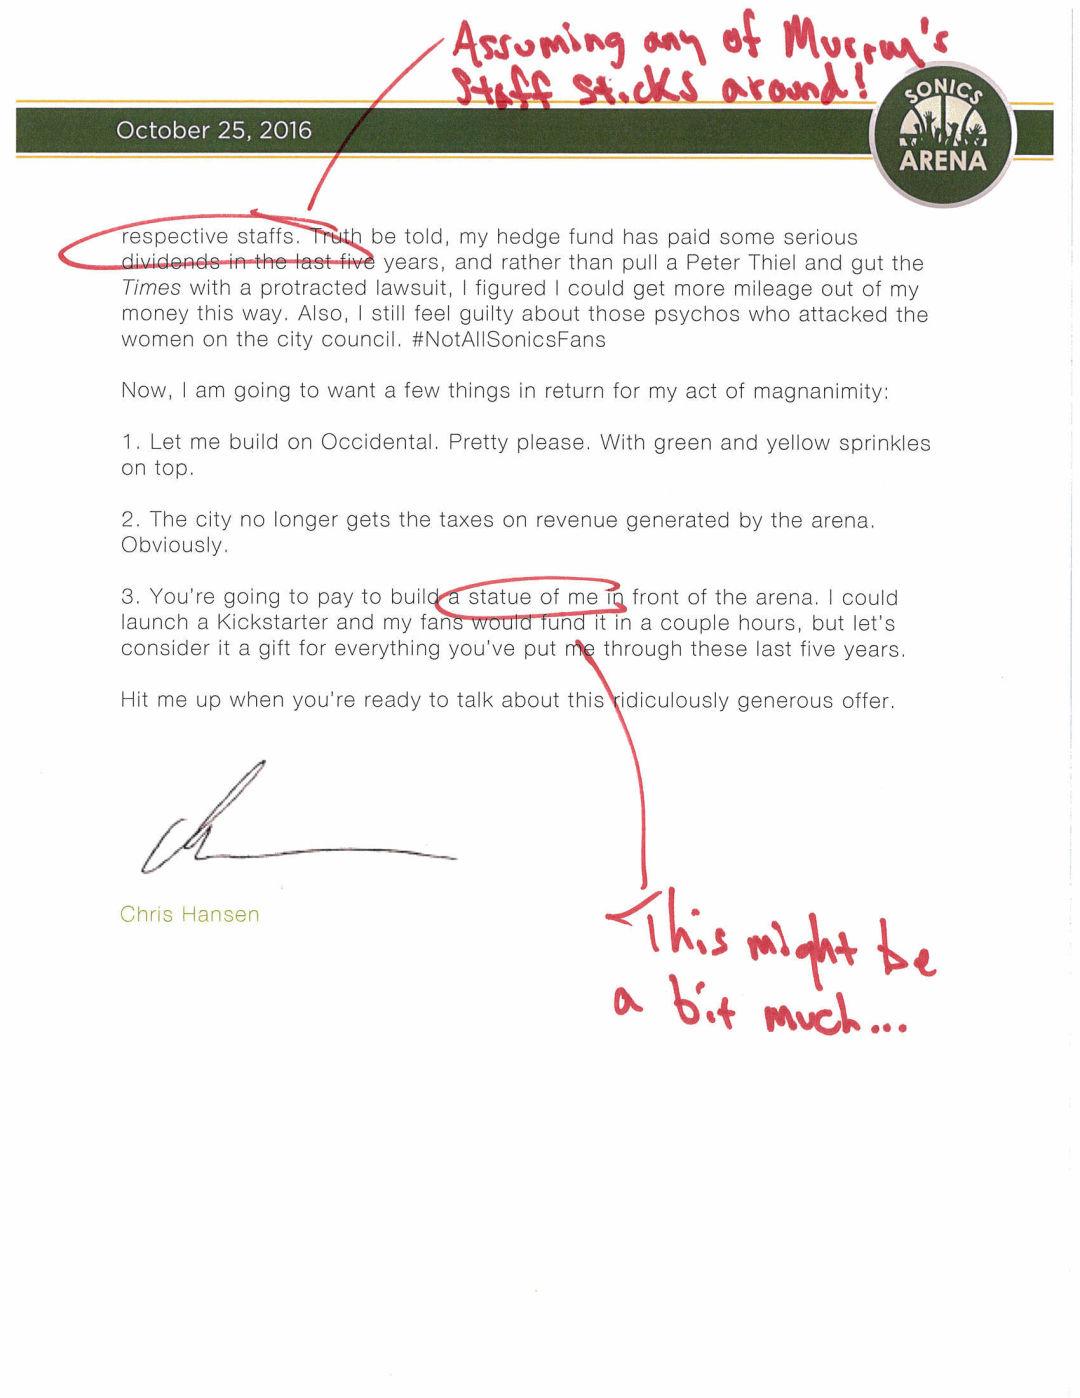 Hansen unedited letter page 2 rcg5jy